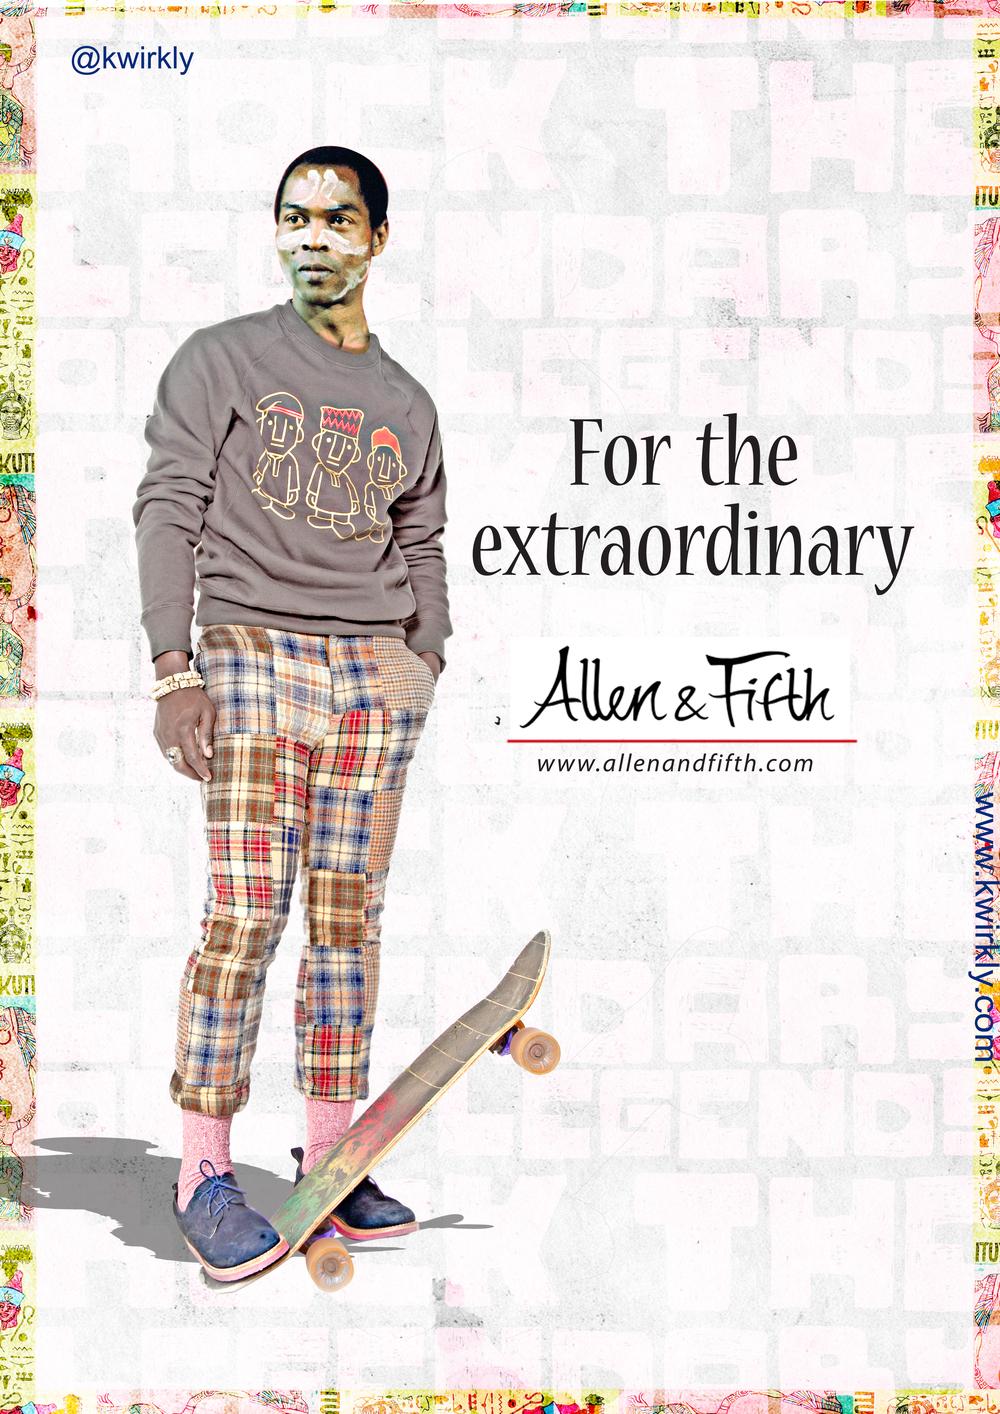 Allen&Fifth_Fela_Kwirkly.jpg